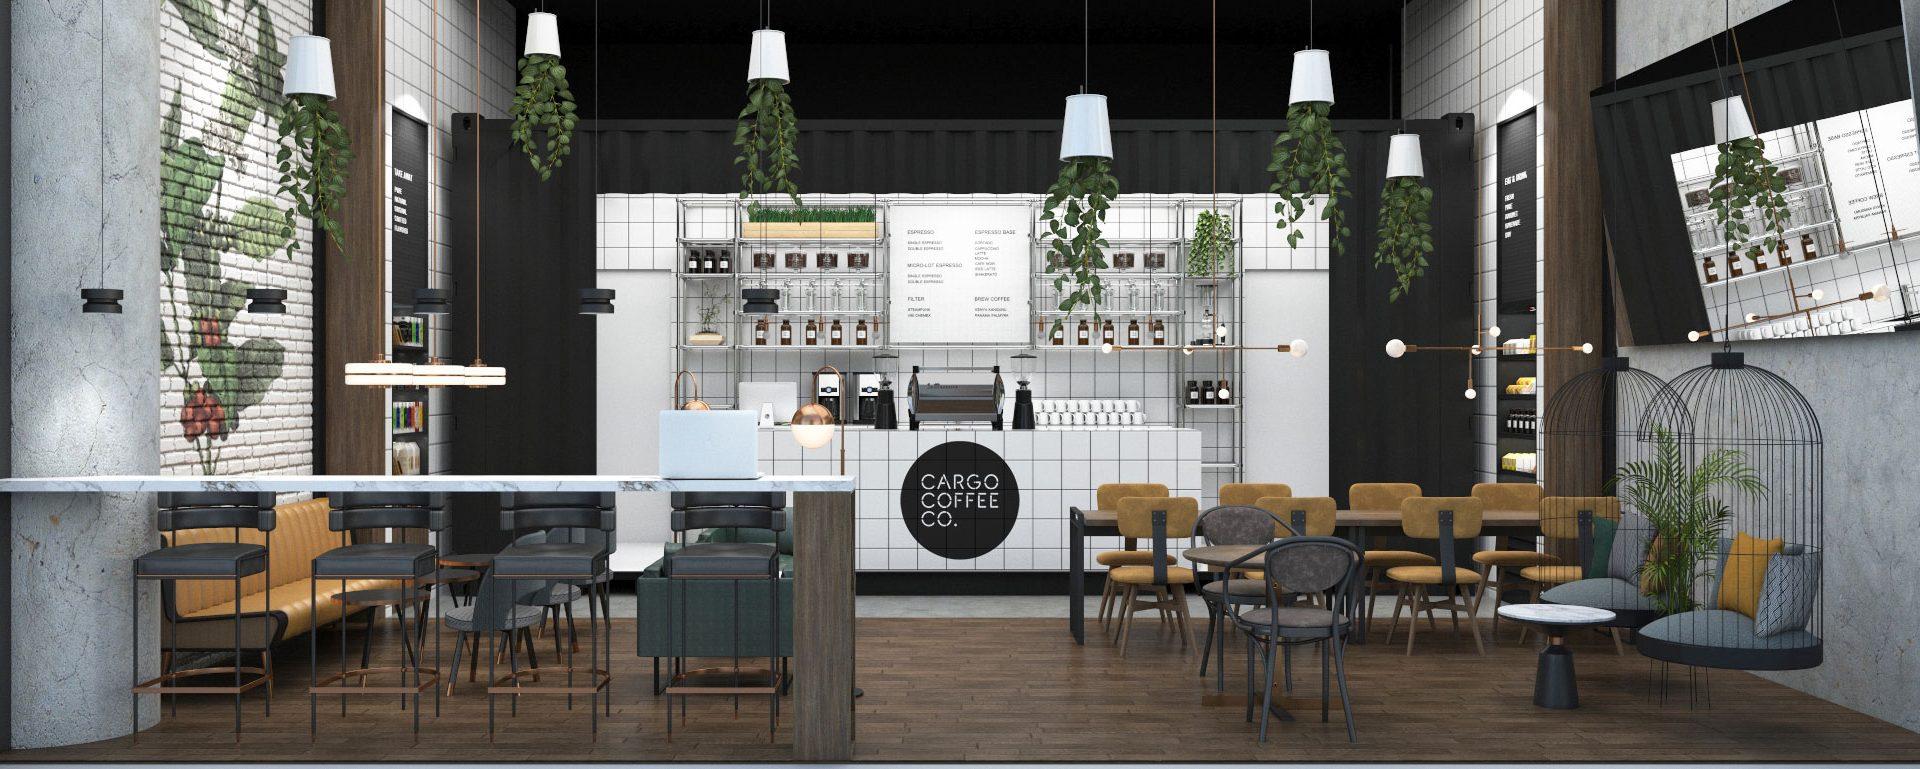 Cargo Coffee Co., Istanbul - FIG